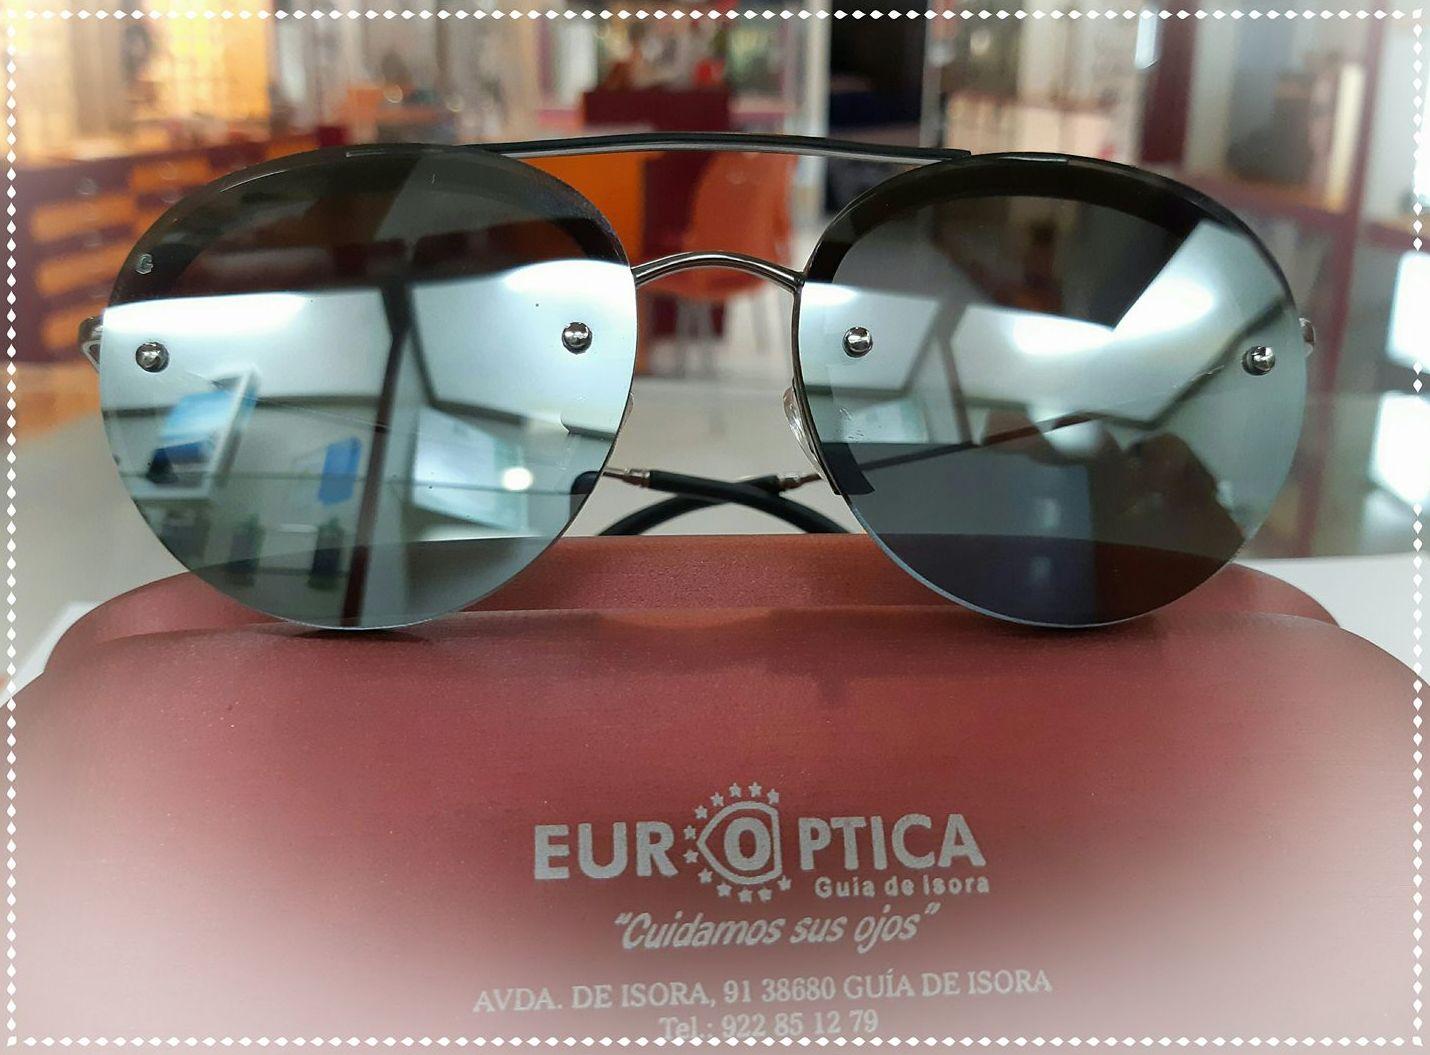 Oferta de gafas de sol en Guía de Isora GIGI